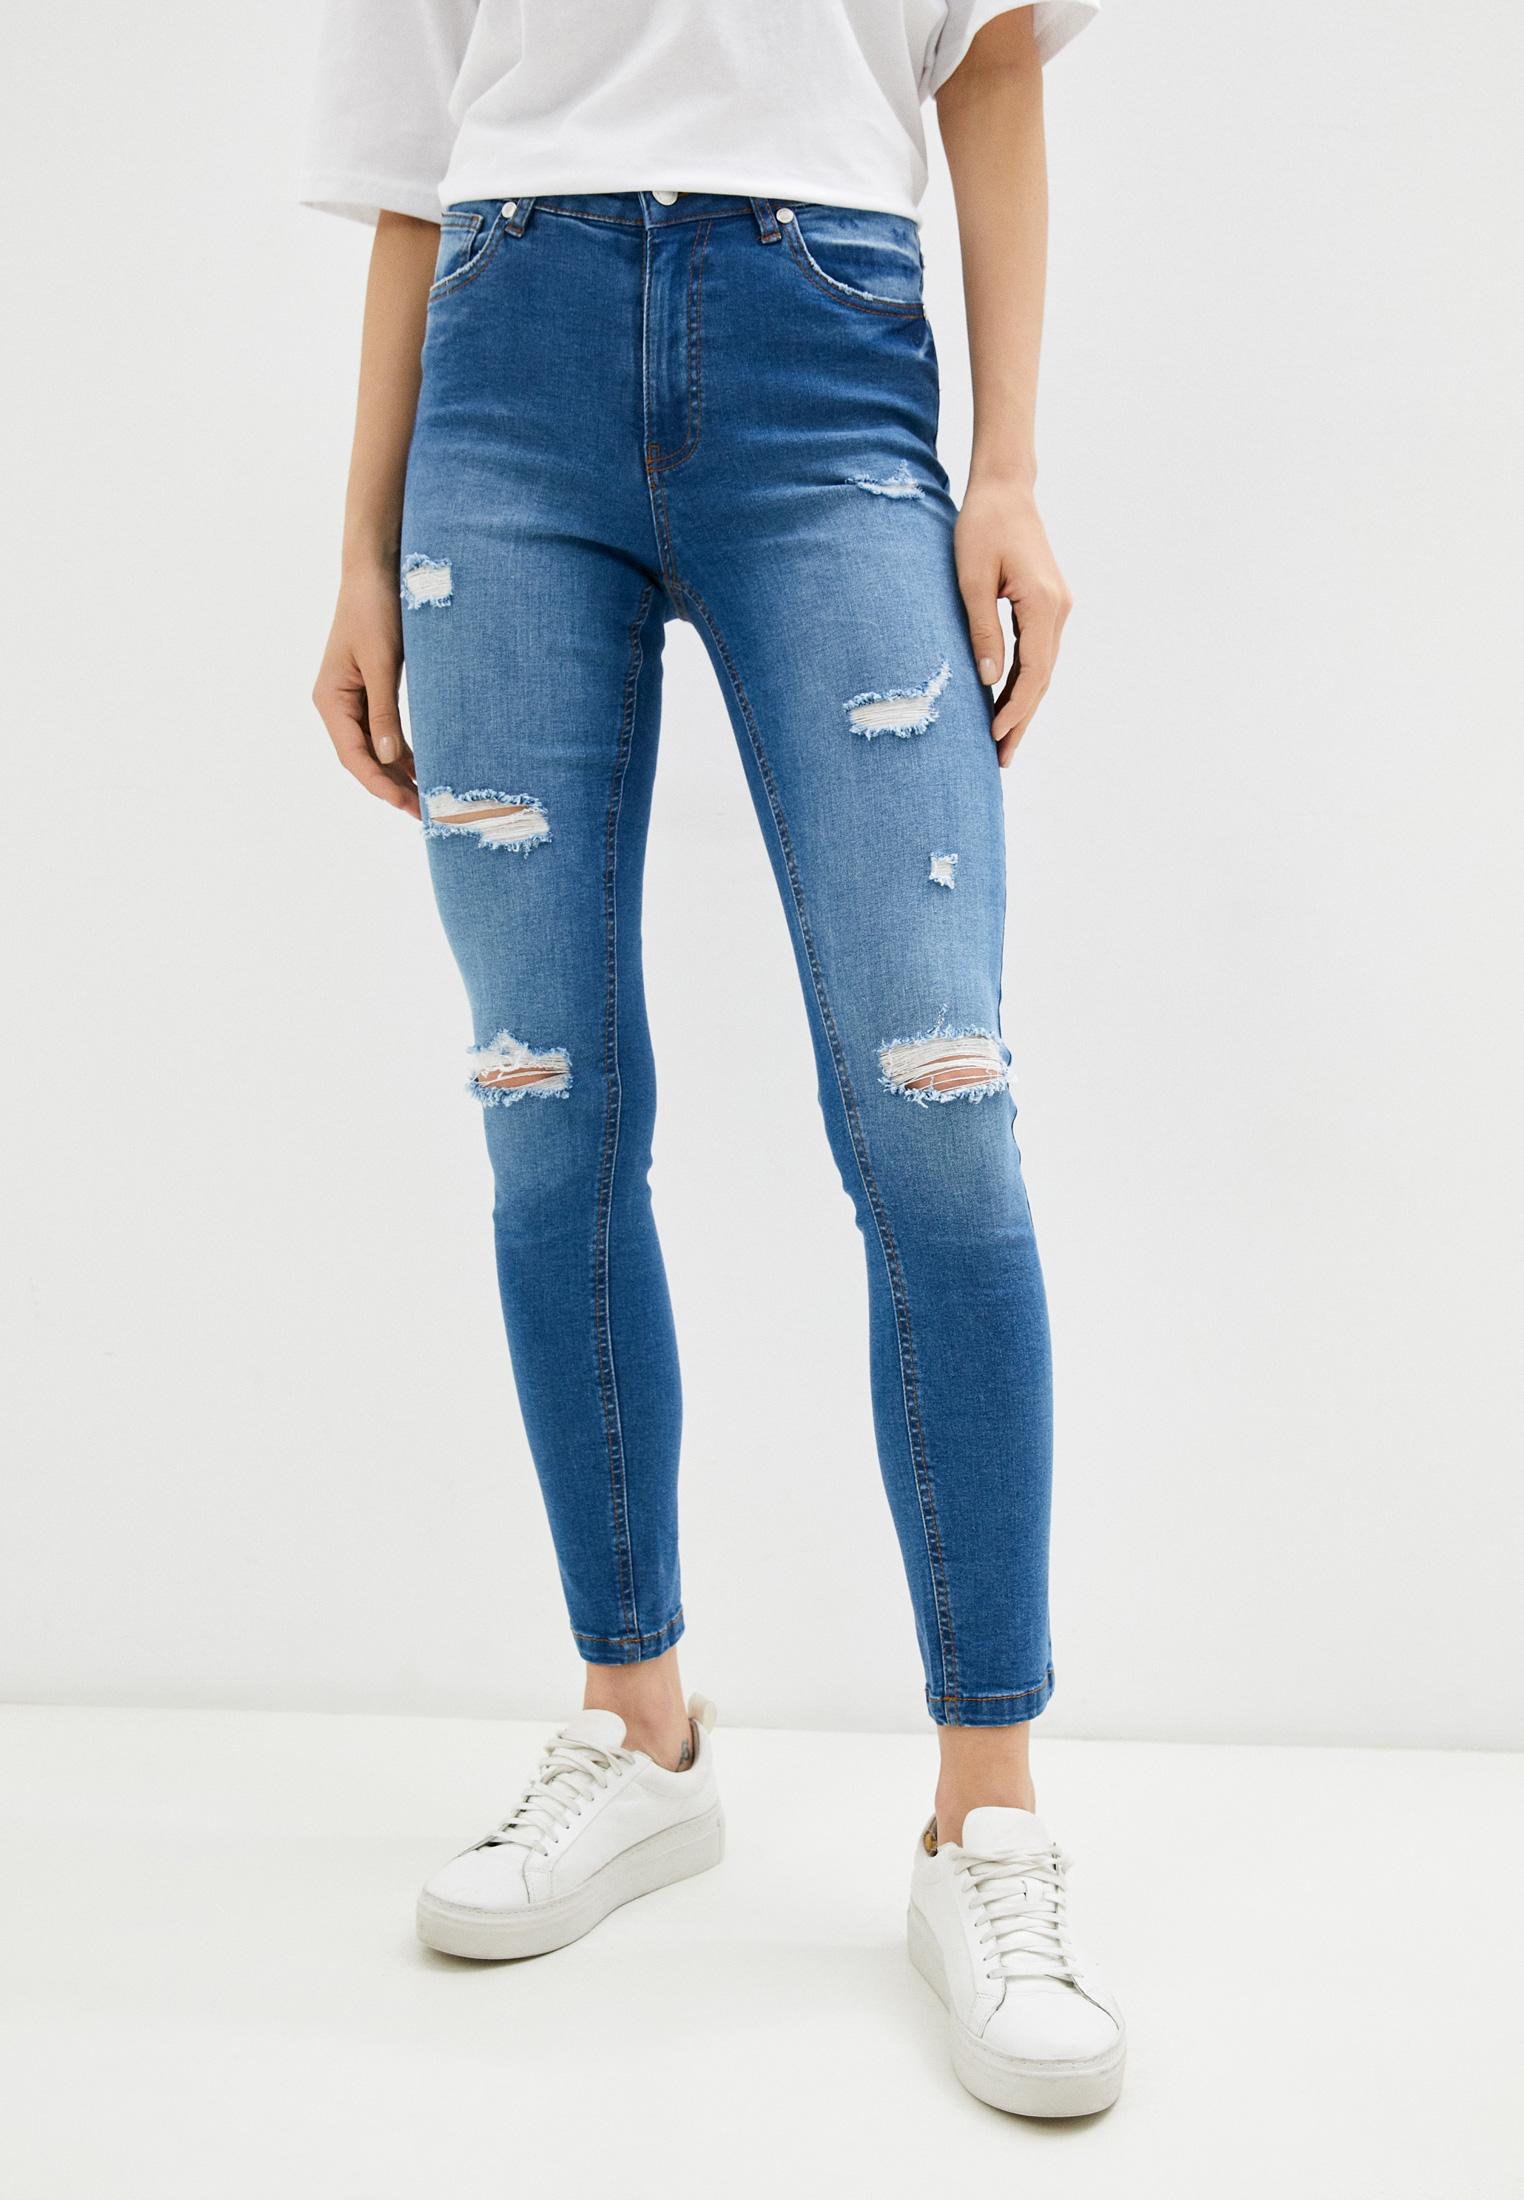 Зауженные джинсы Silvian Heach Джинсы Silvian Heach